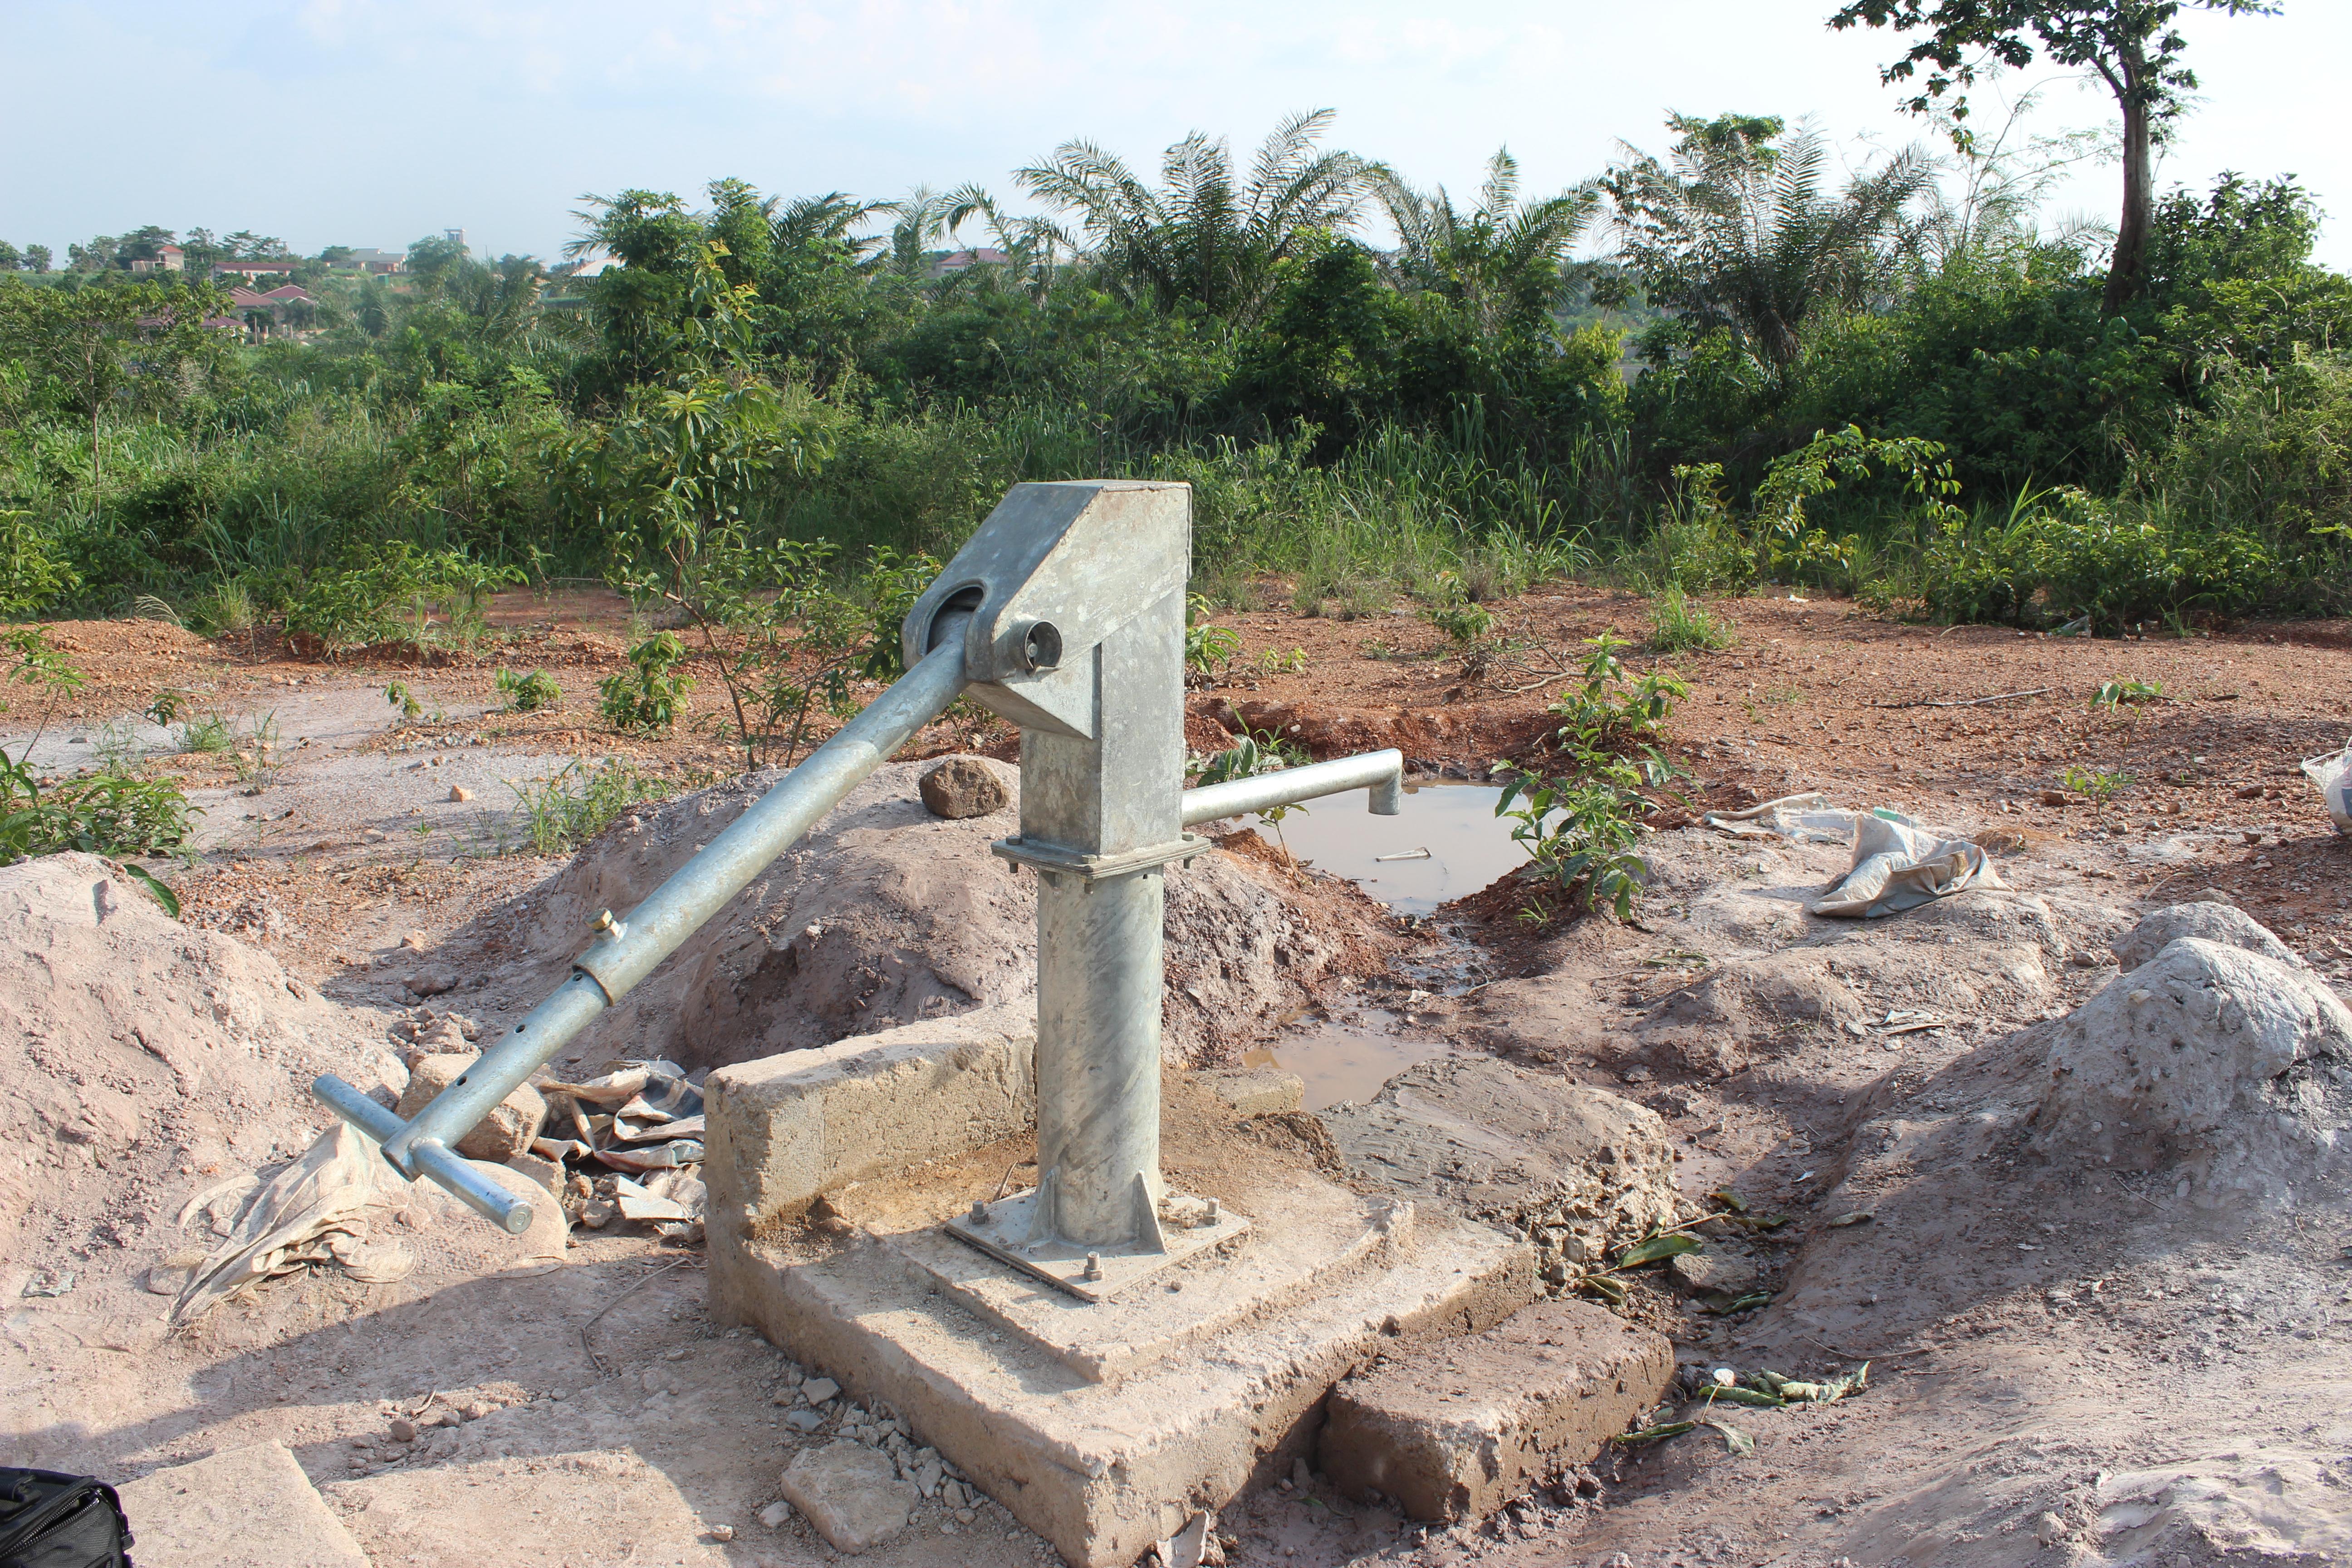 Providing fresh water